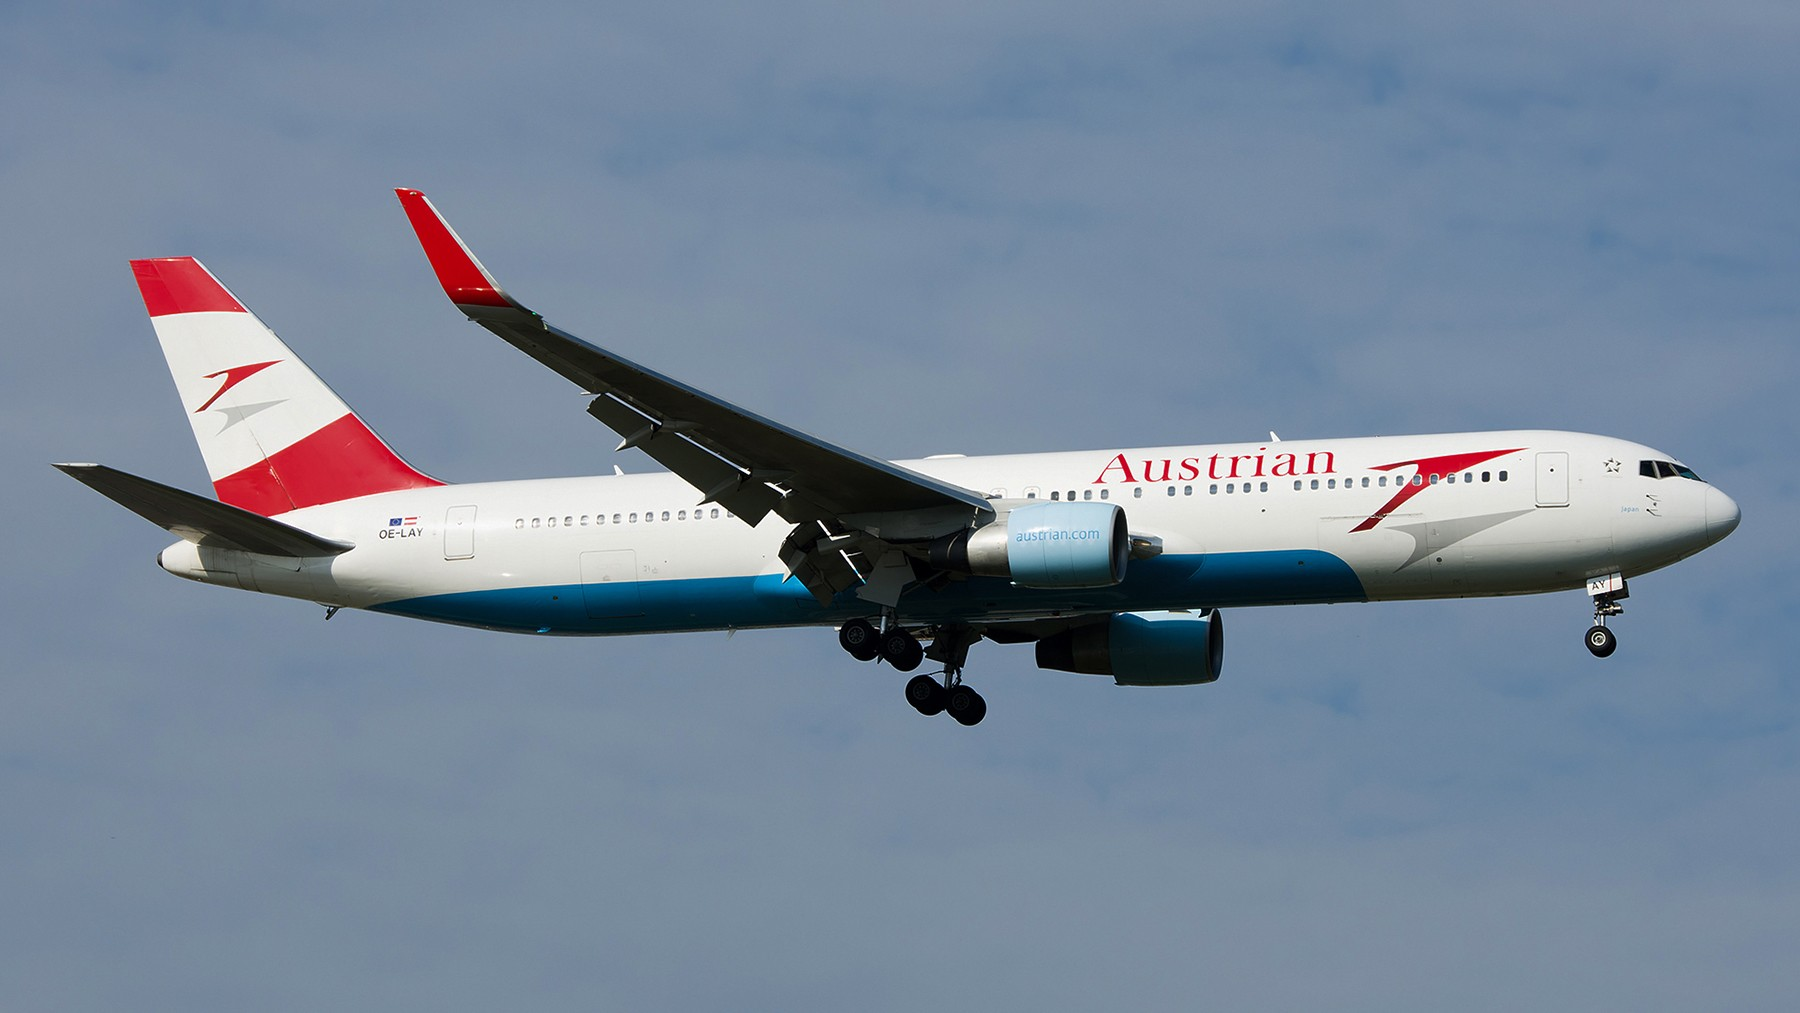 Re:[原创]终于放假了,出来冒个泡,随便发几张 BOEING 767-300ER OE-LAY 中国北京首都国际机场